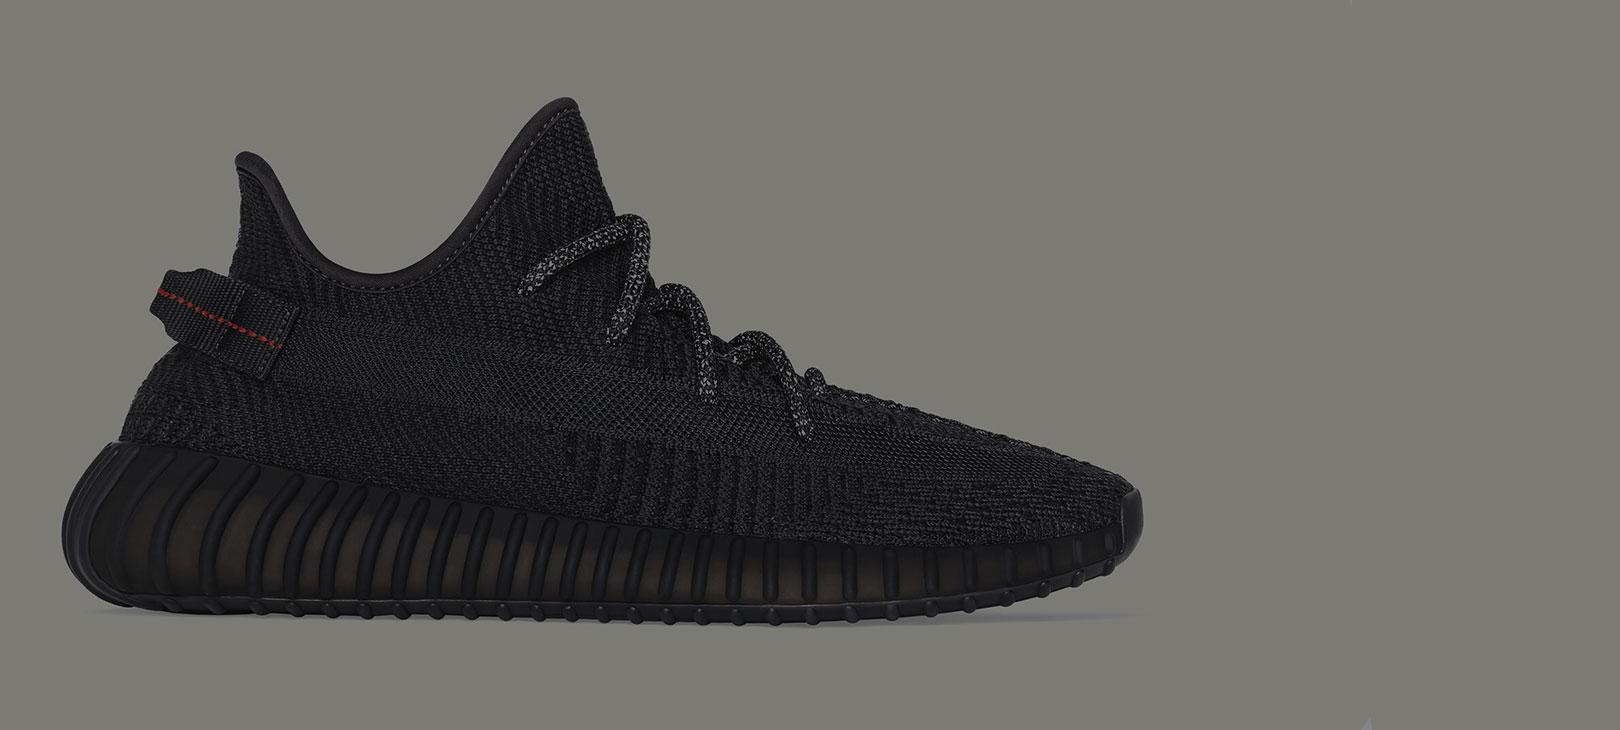 94306ebb adidas Yeezy 350 Black FU9006 - Release Date   SneakerNews.com